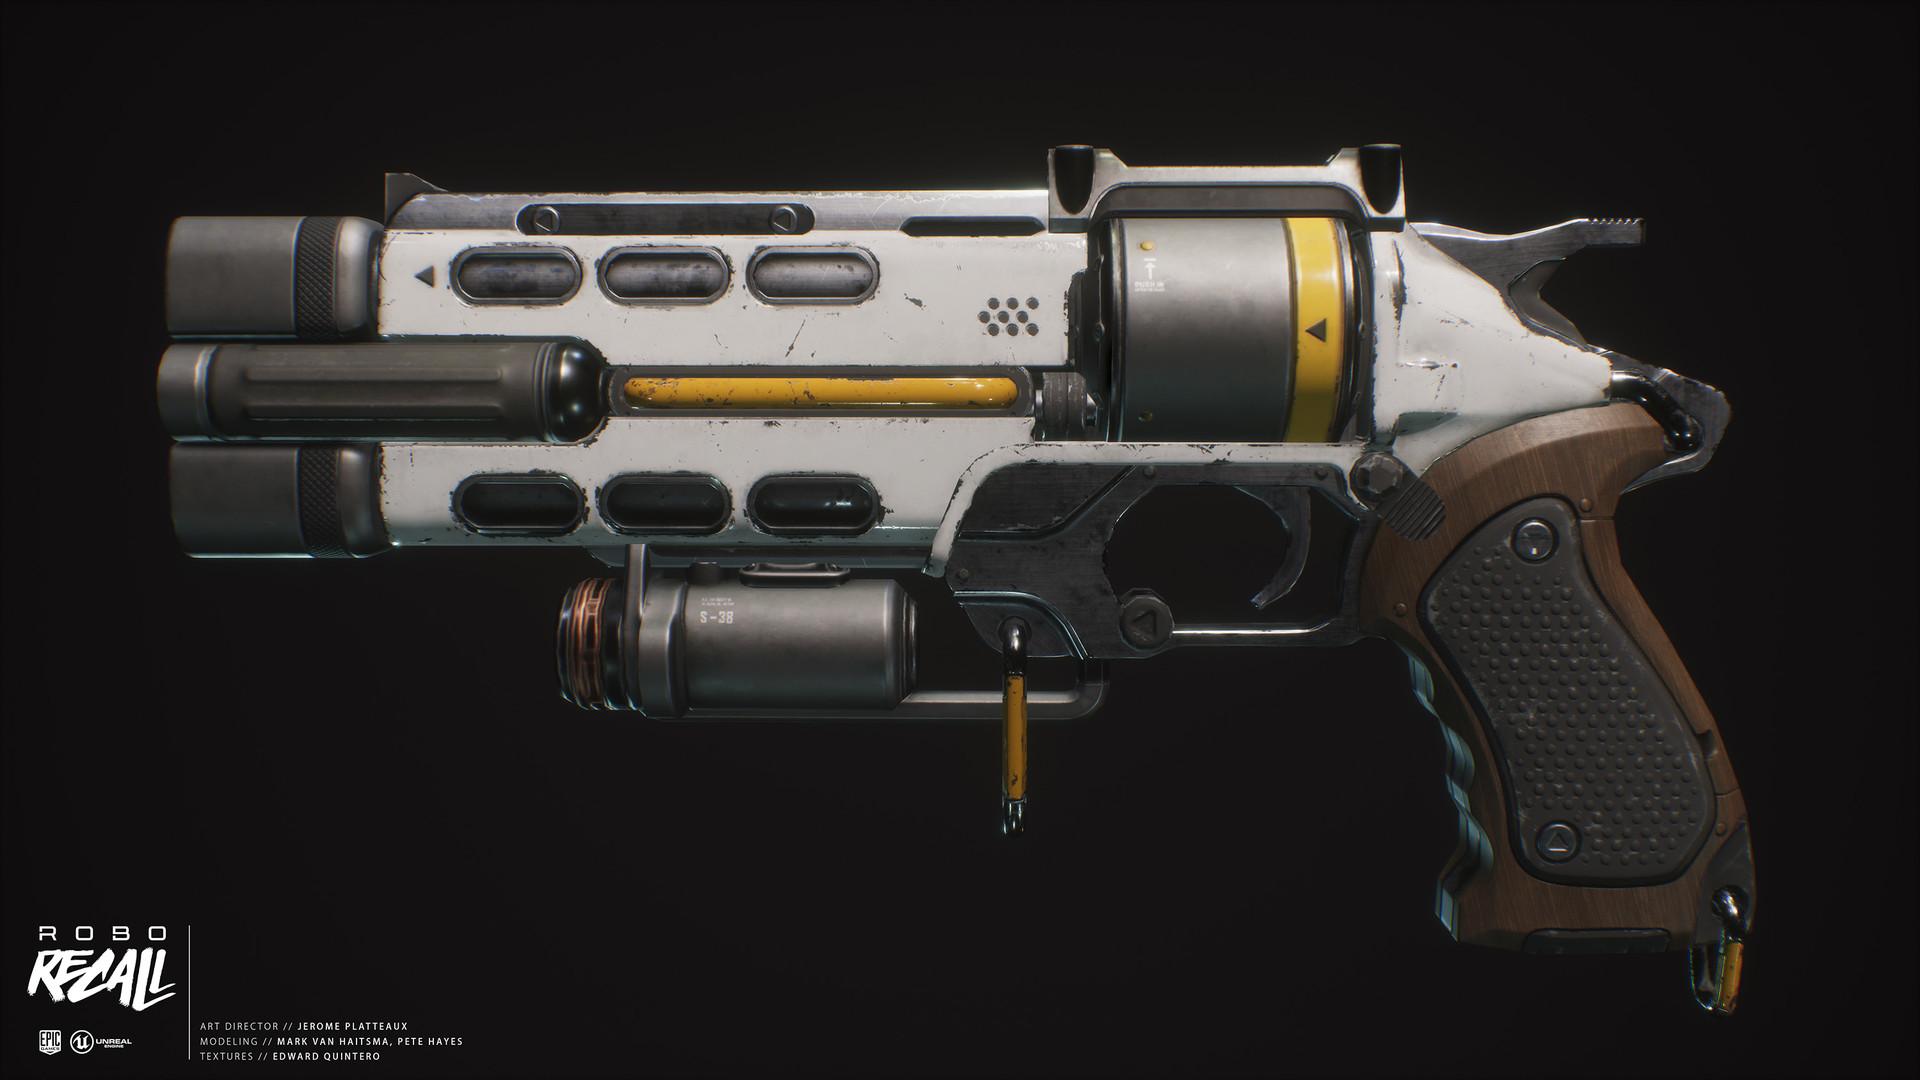 Mark van haitsma revolver 01